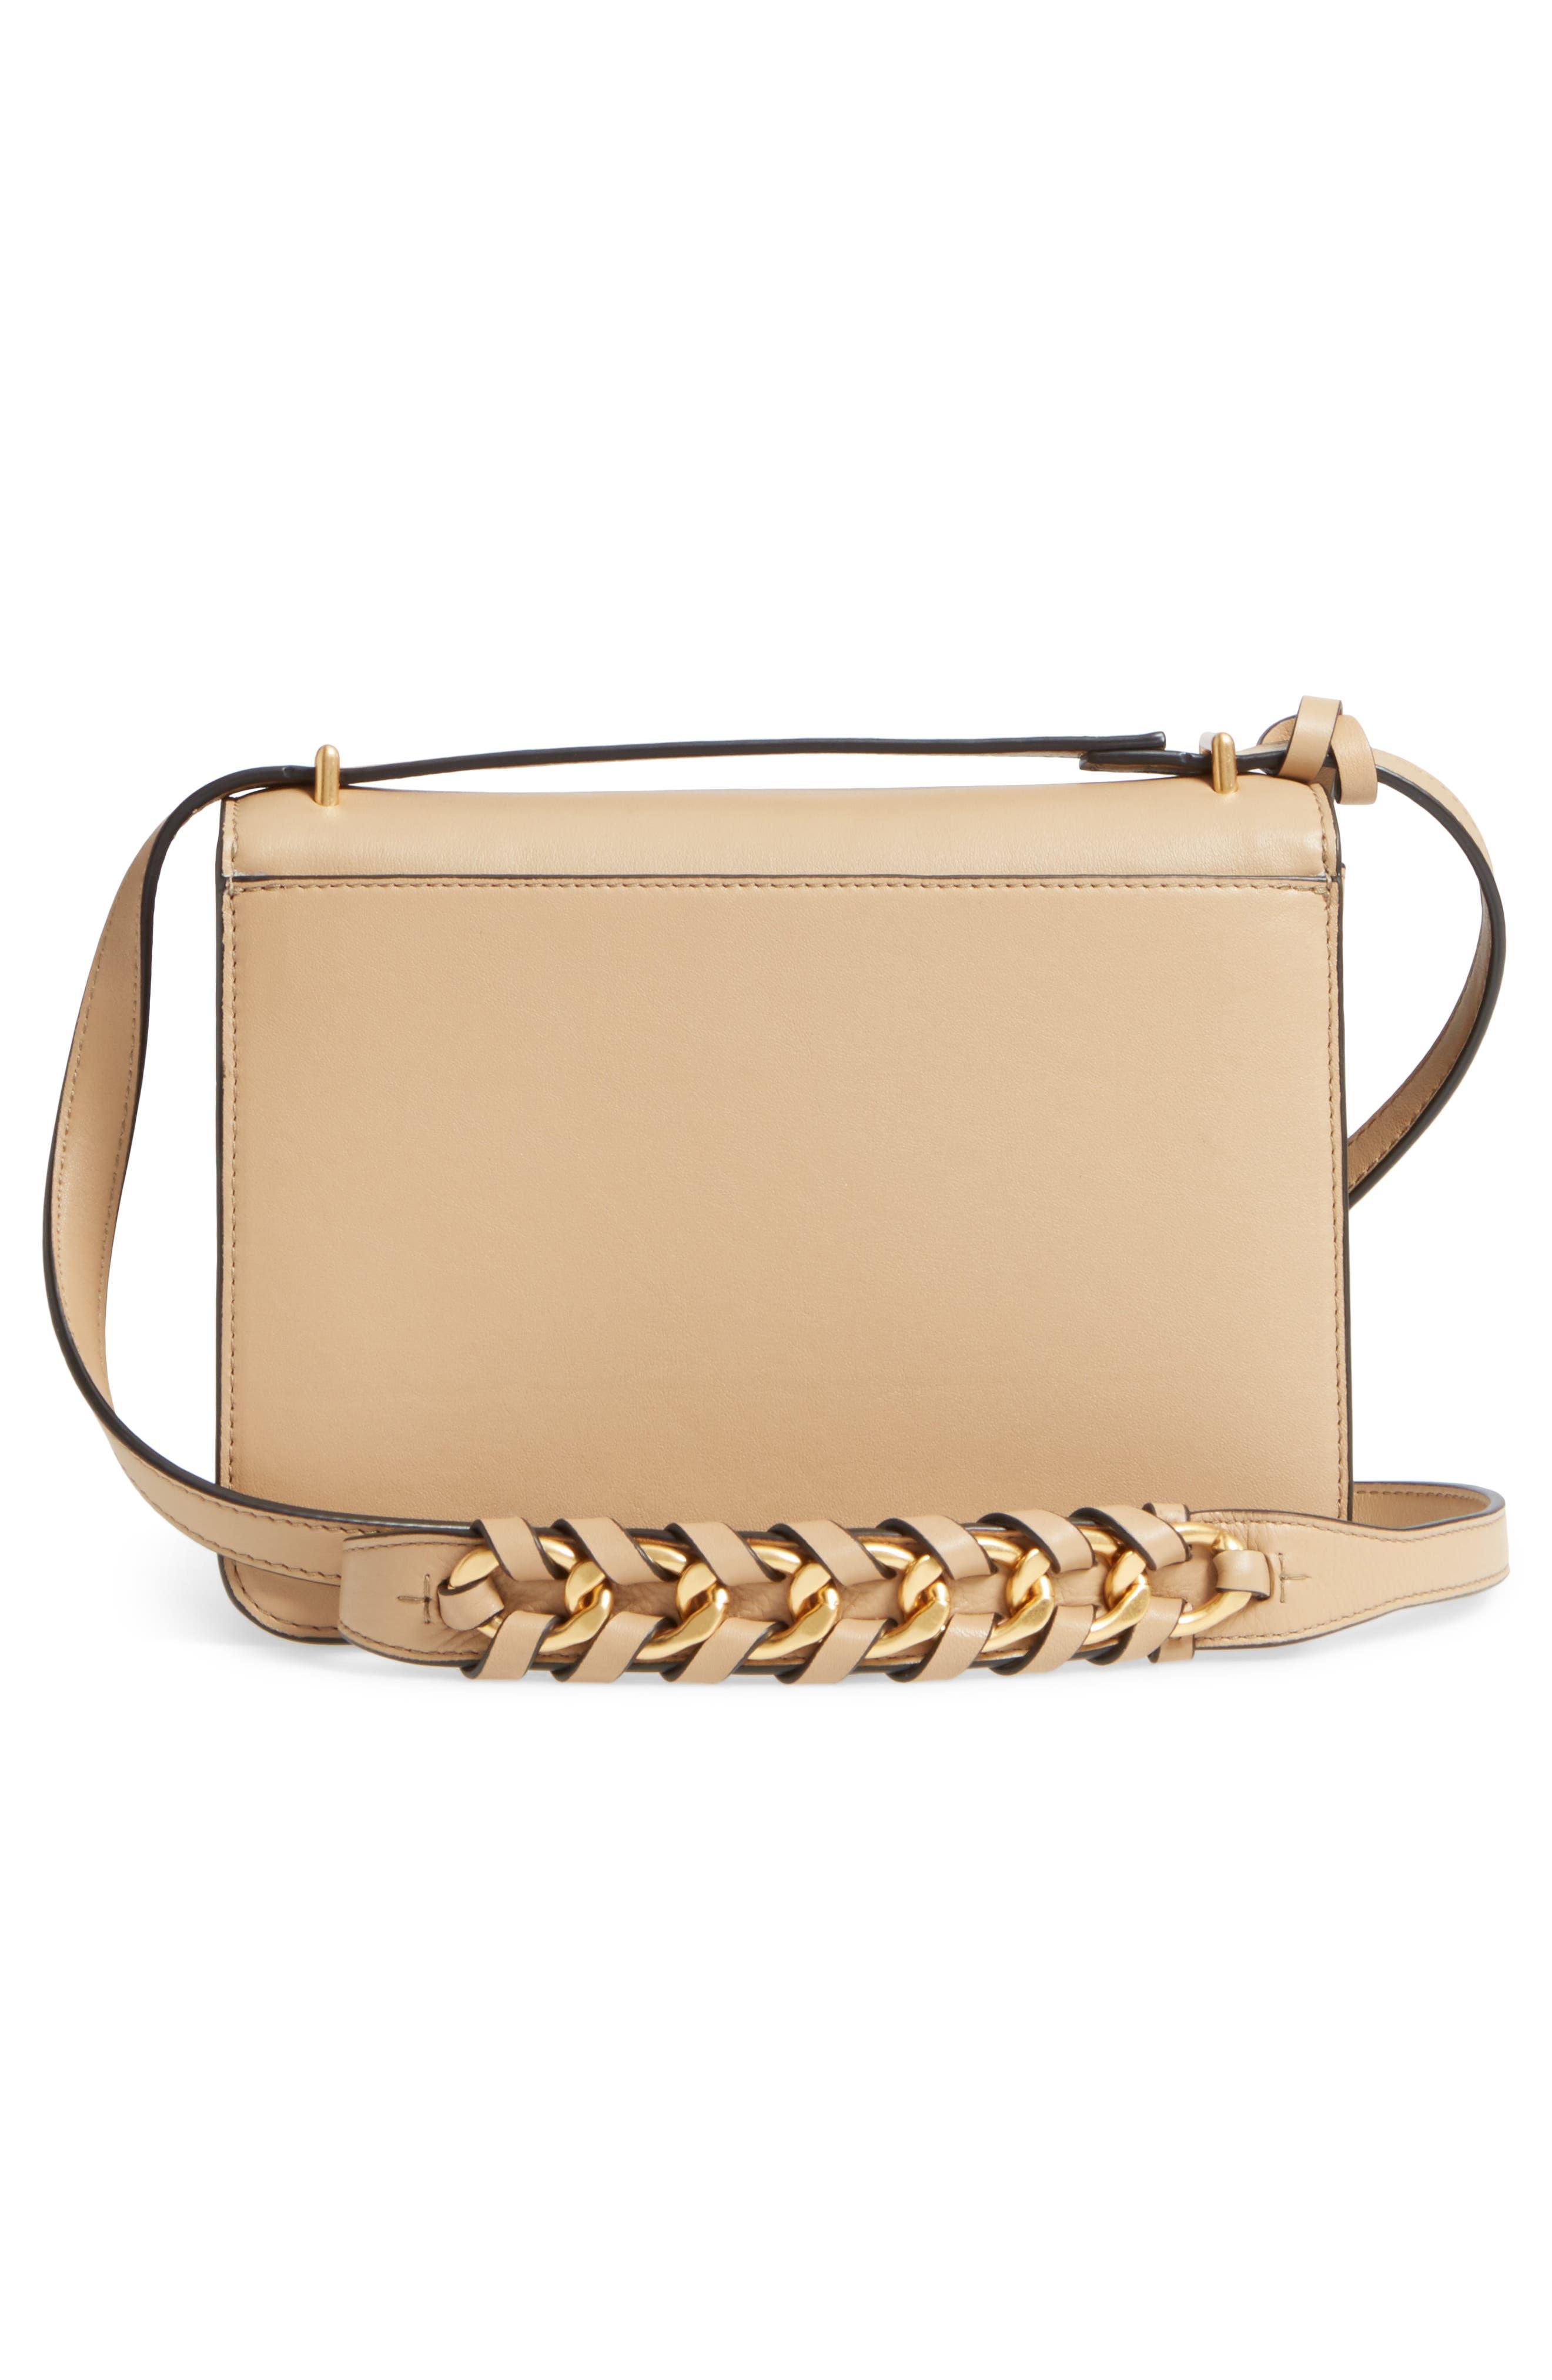 Brooke Leather Crossbody Bag,                             Alternate thumbnail 8, color,